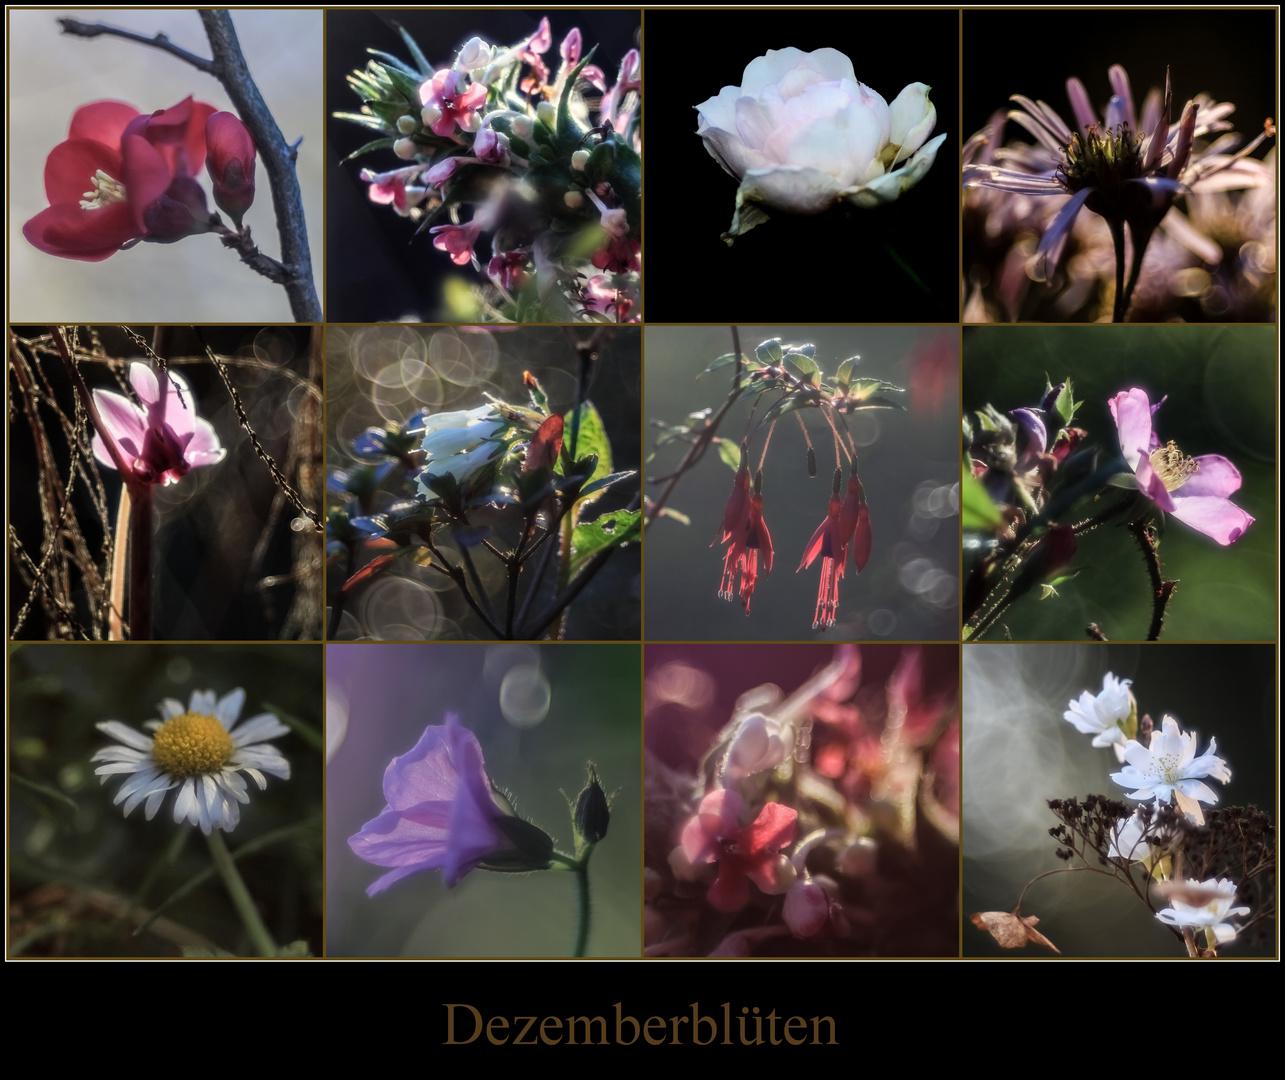 Dezemberblüten